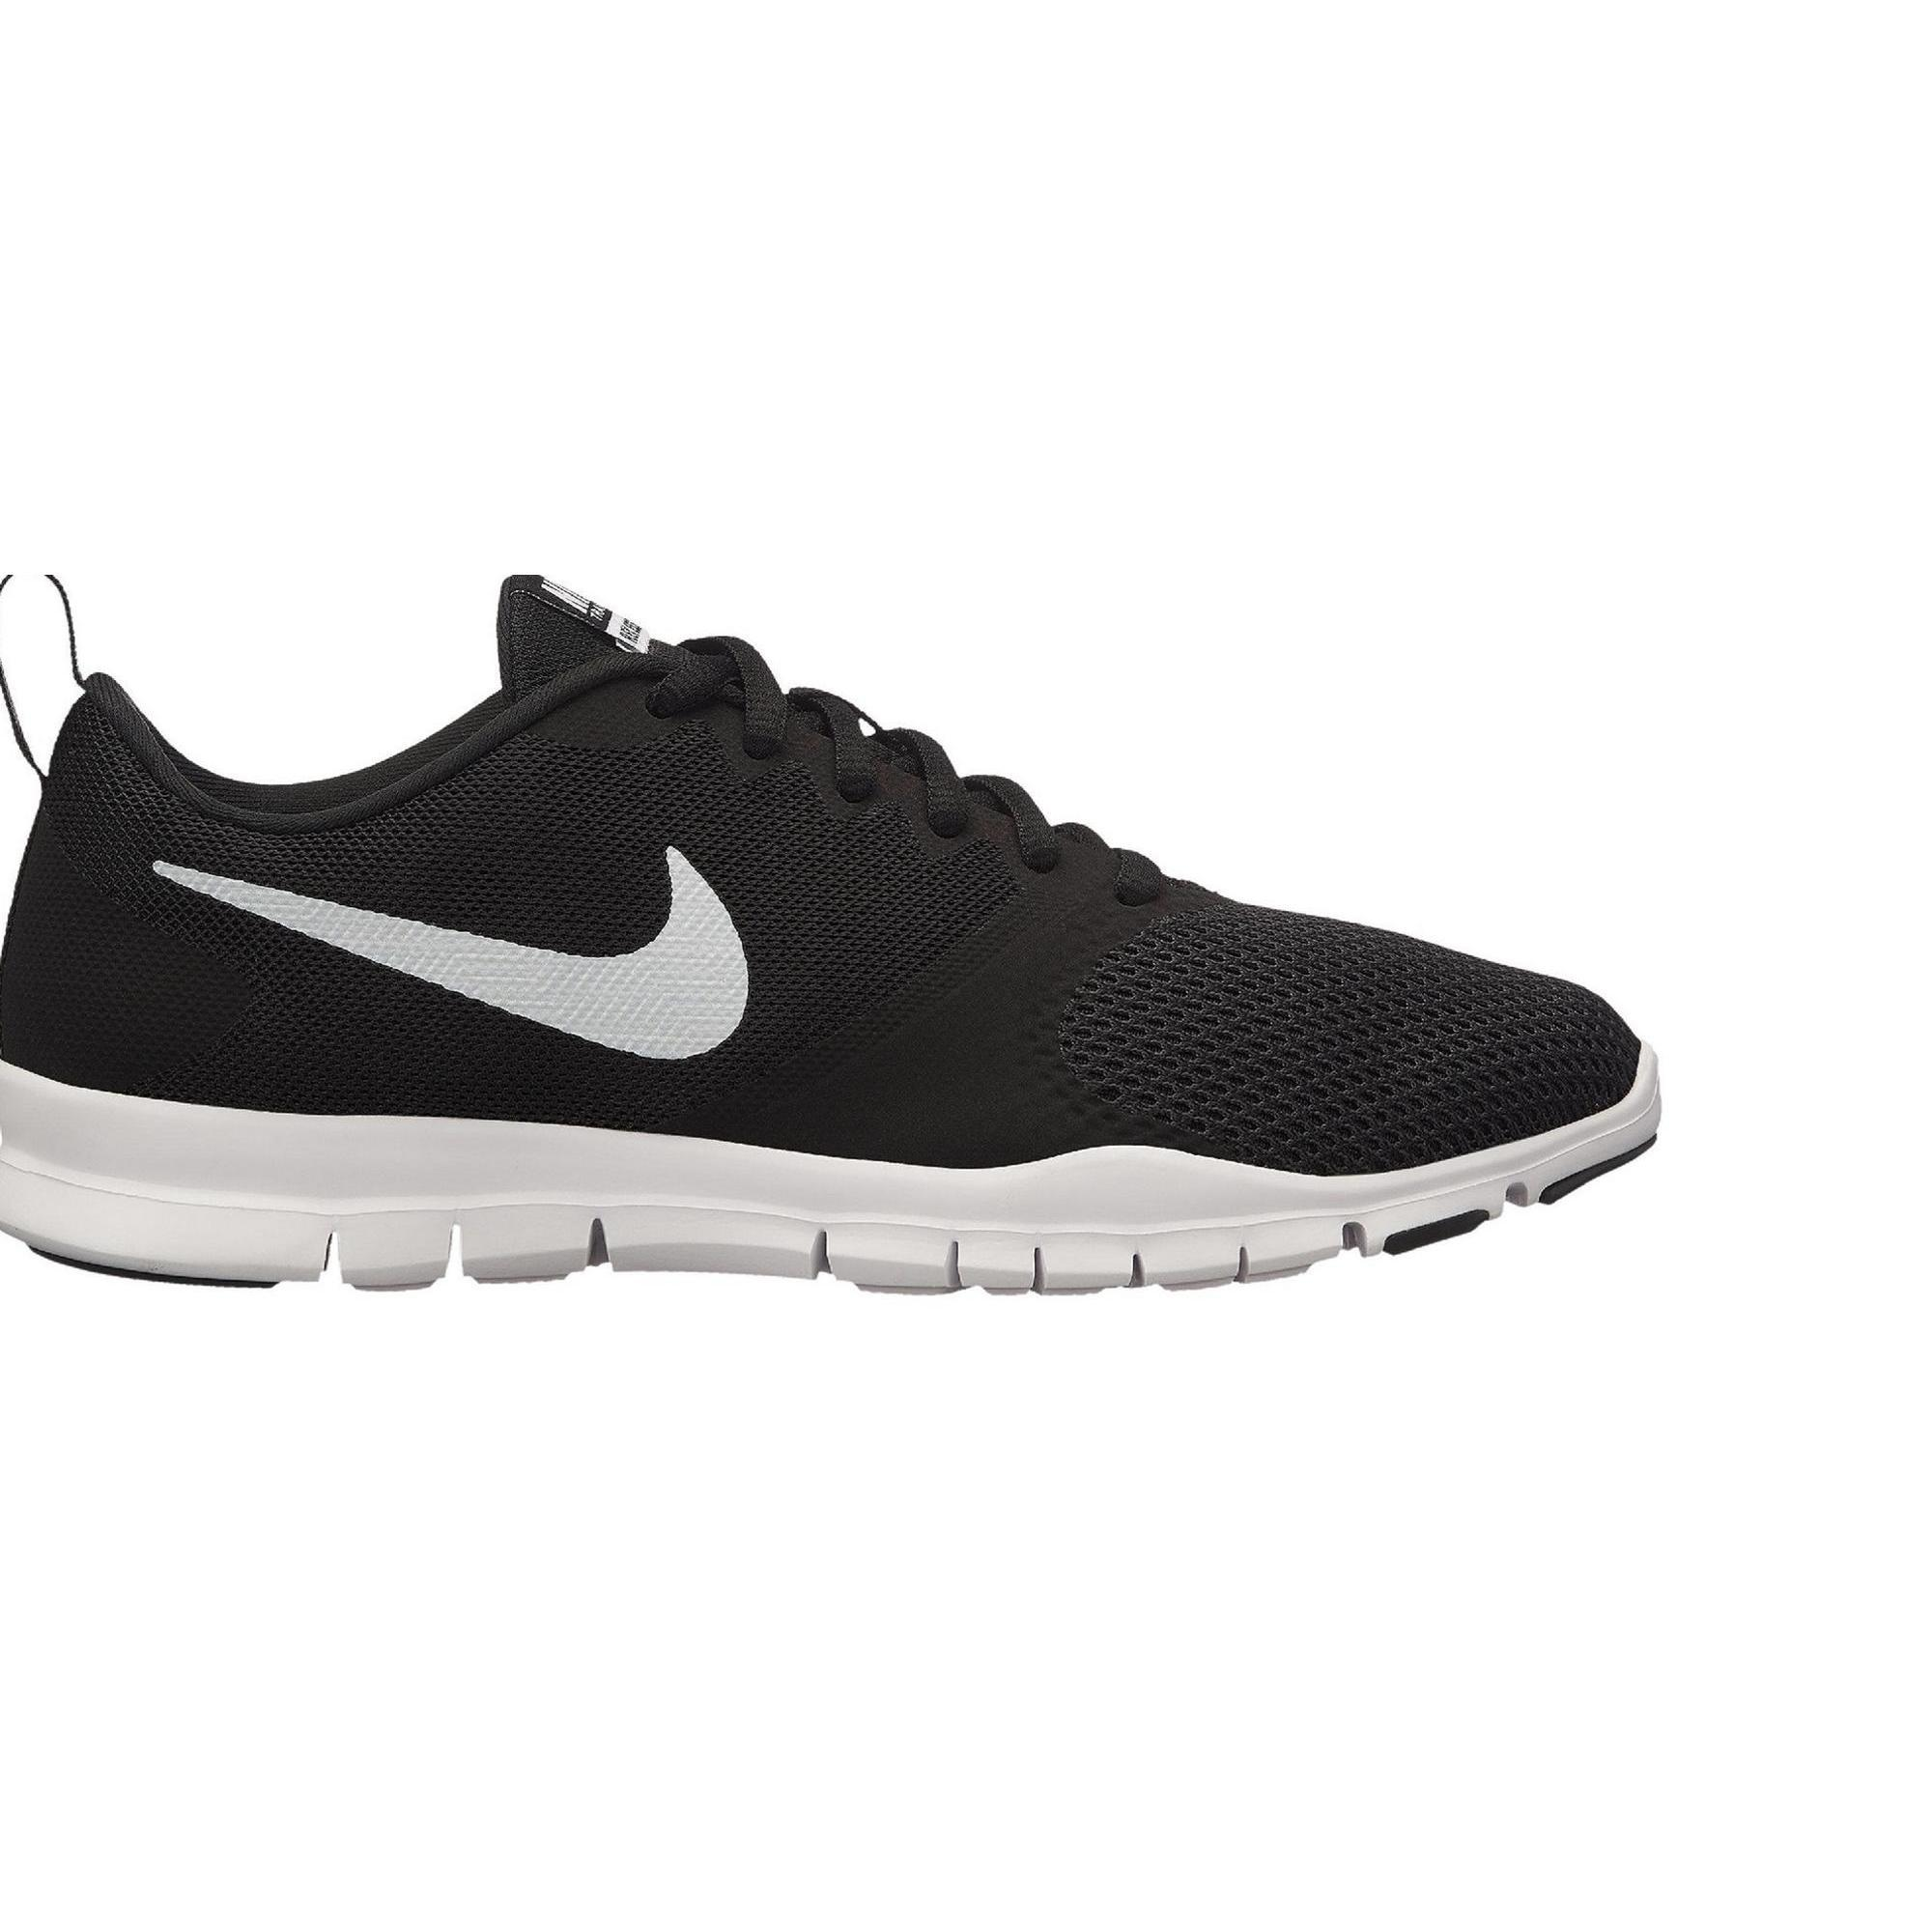 cheap for discount 47d57 7c0f1 Comprar Zapatillas de Fitness Online   Decathlon